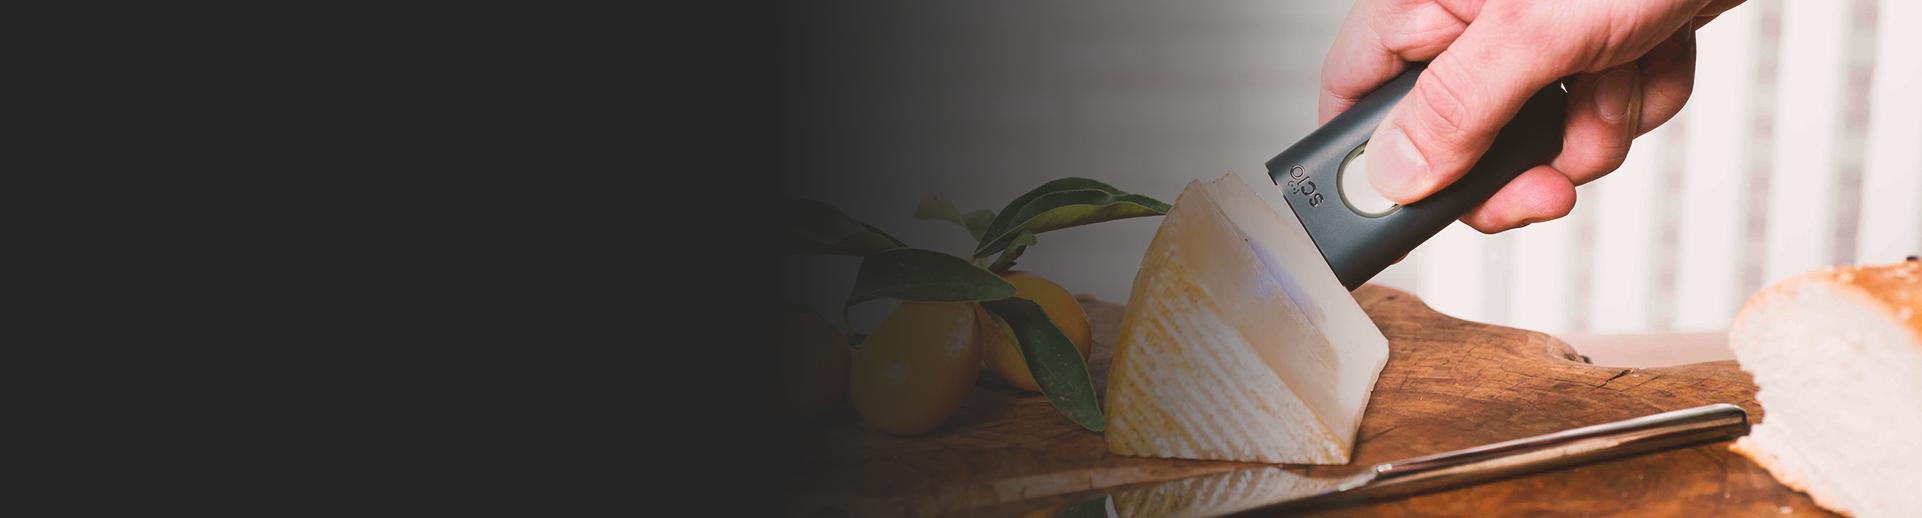 SCiO Molecular Sensor scanning cheese